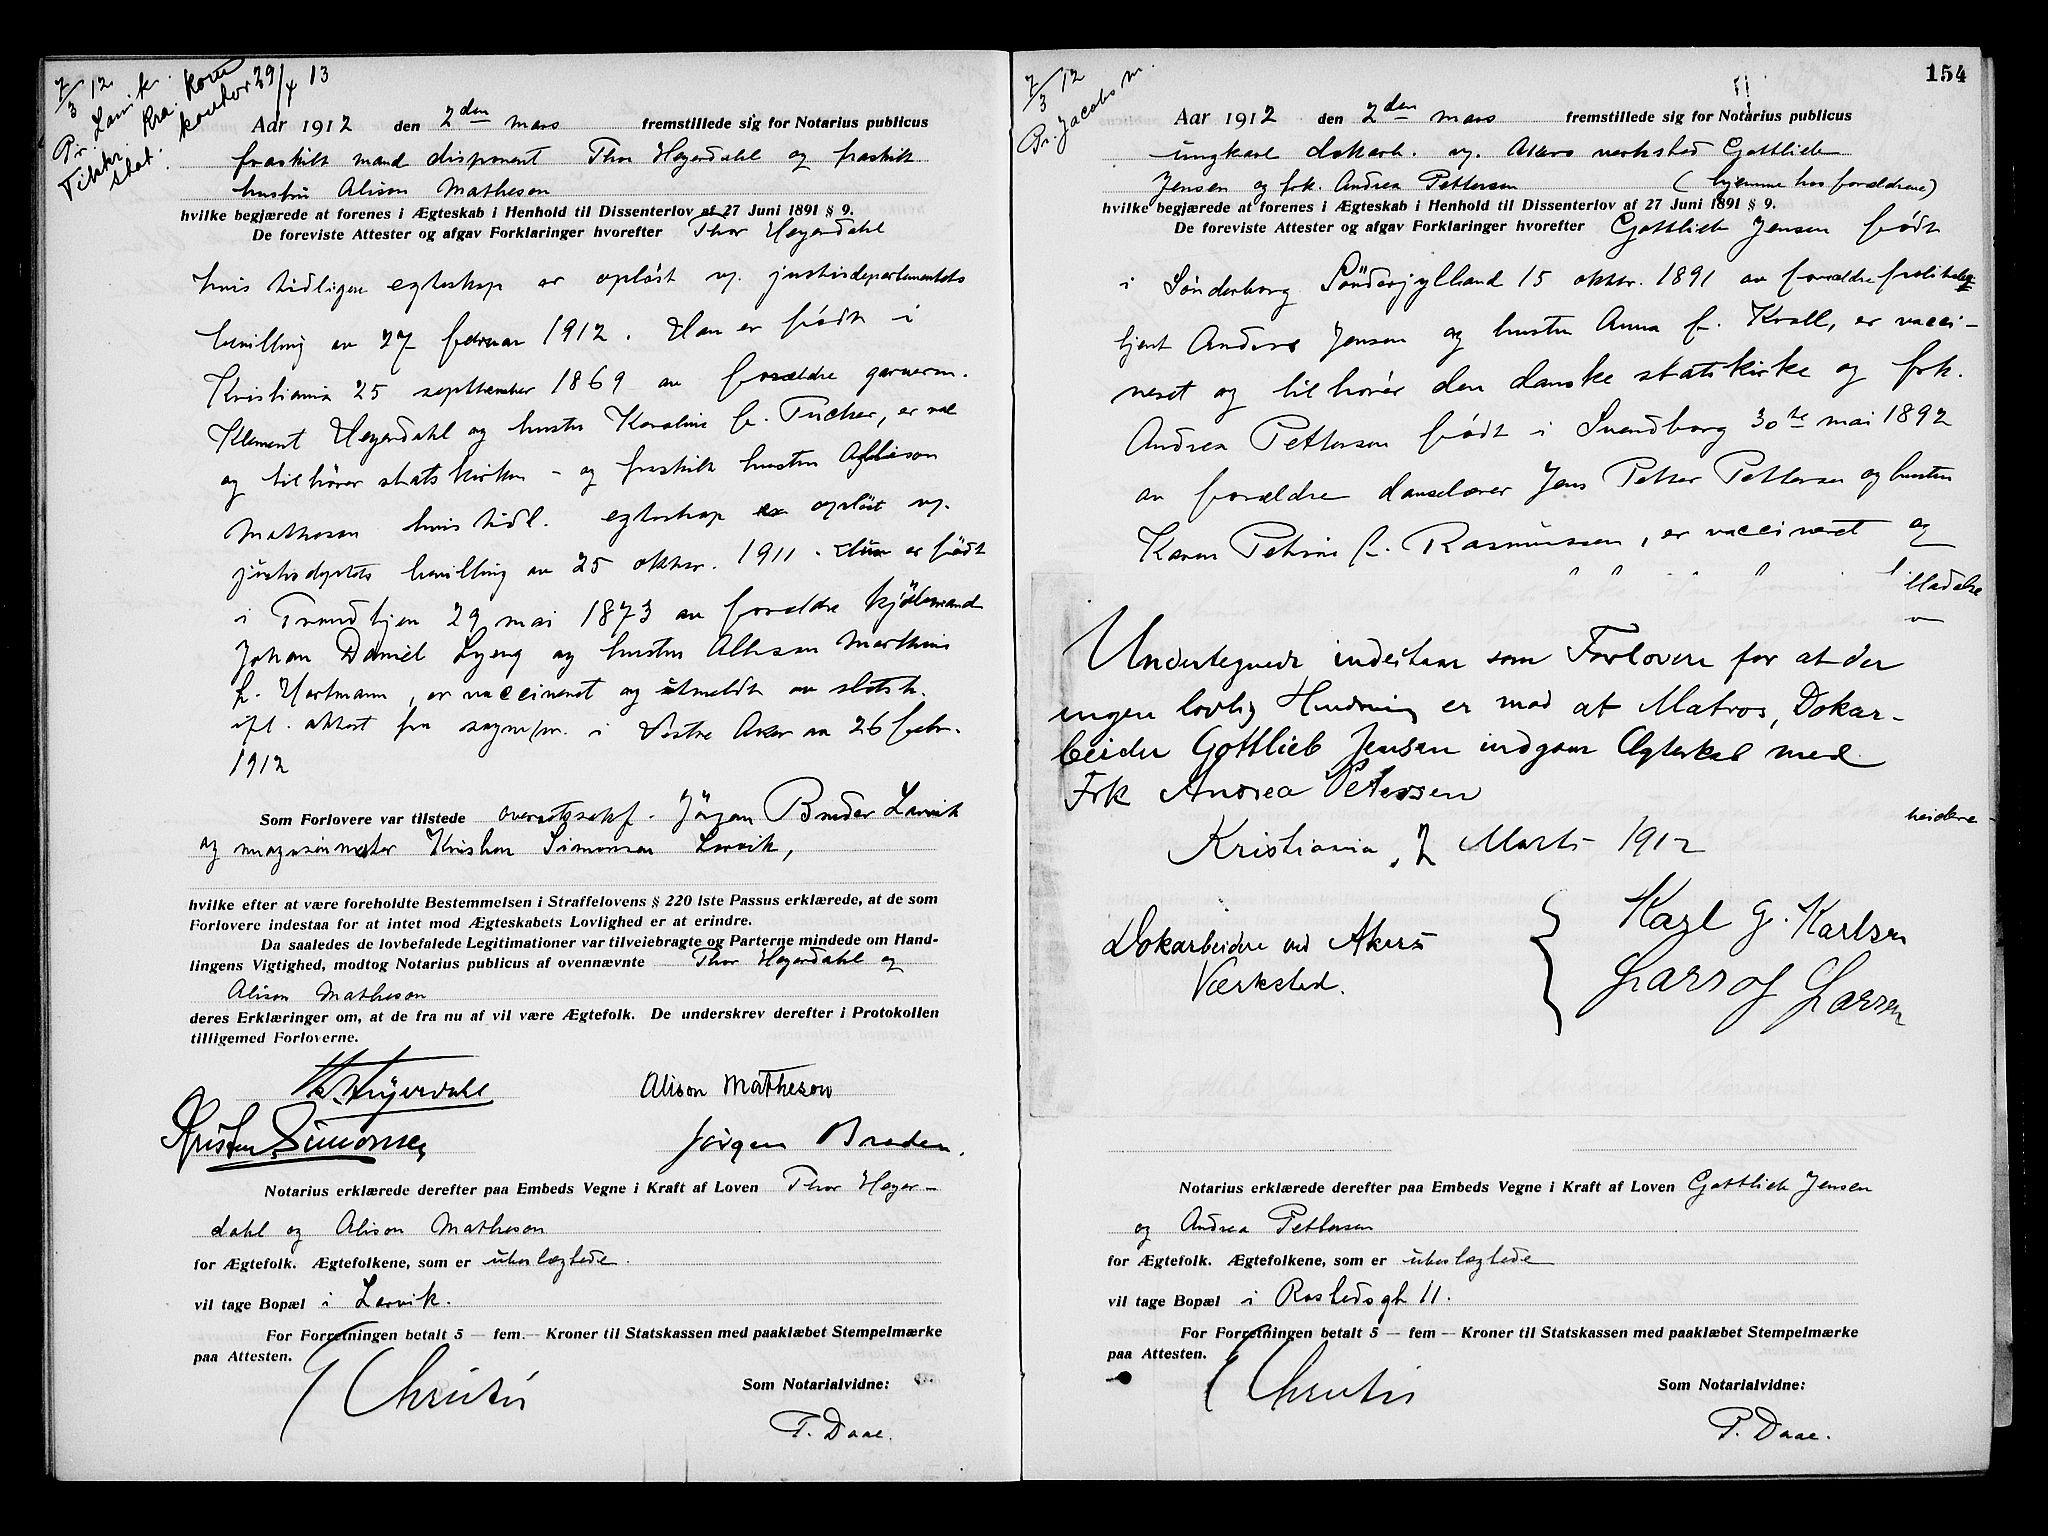 SAO, Oslo byfogd avd. I, L/Lb/Lbb/L0008: Notarialprotokoll, rekke II: Vigsler, 1911-1913, s. 153b-154a